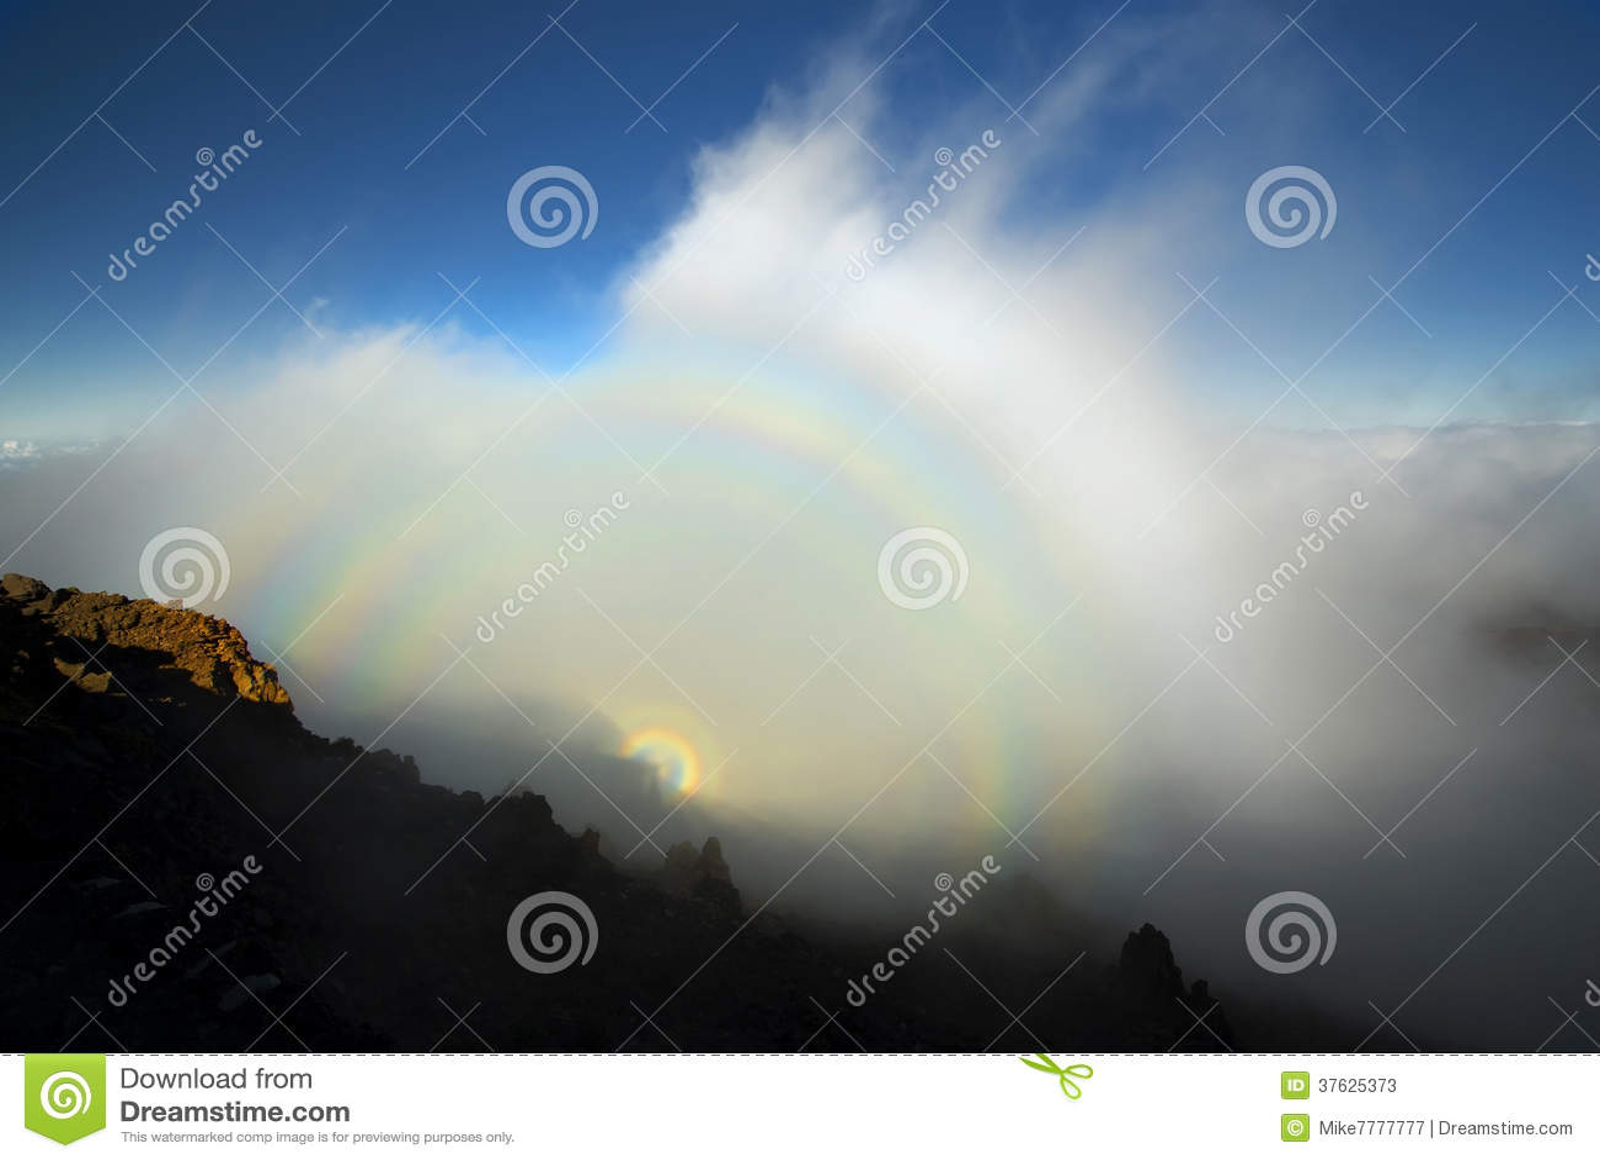 Phénomène optique, parc national de Haleakala, Maui, Hawaï